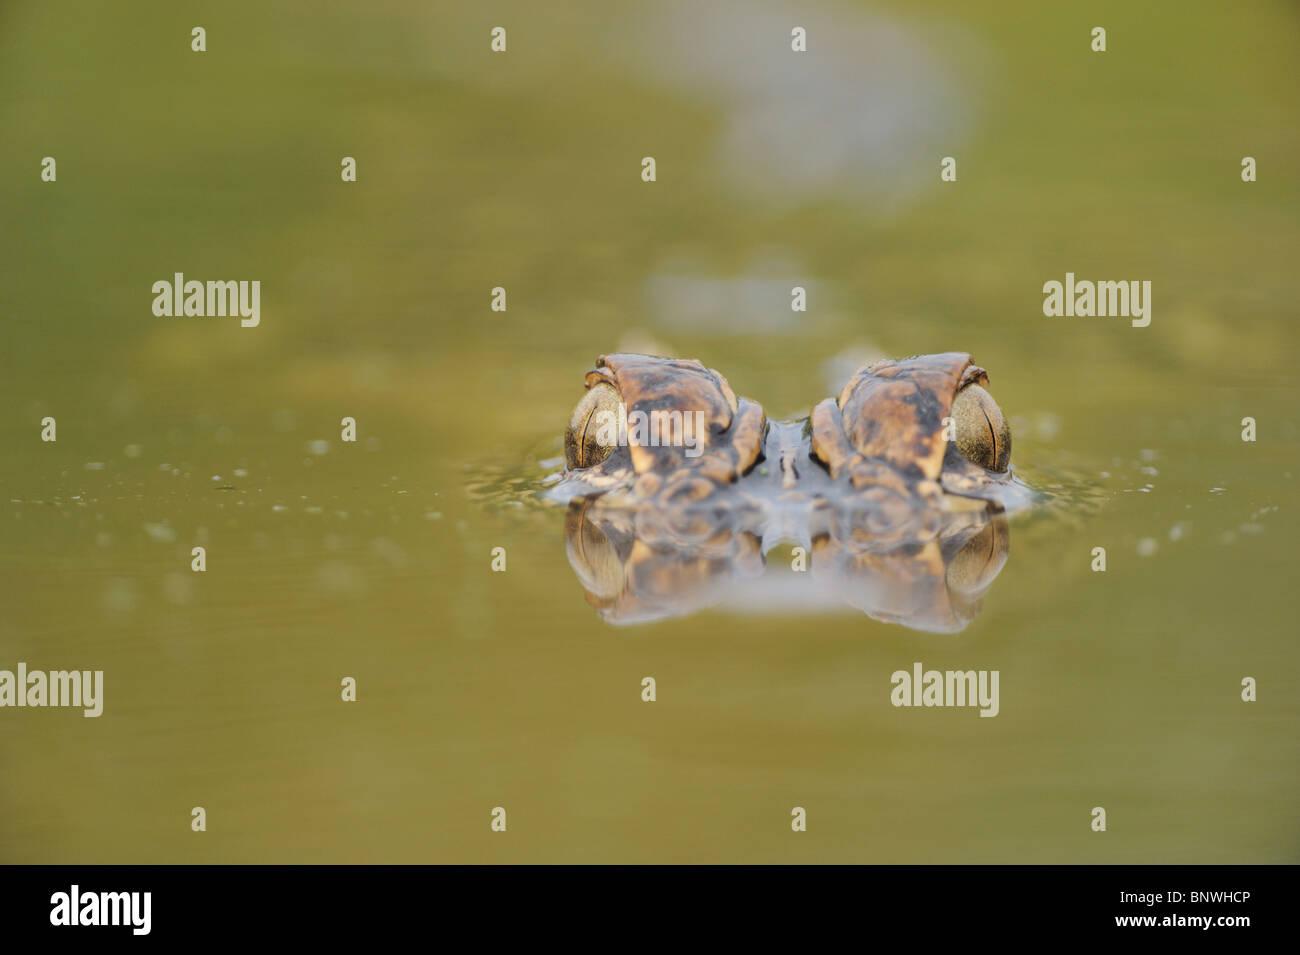 American Alligator (Alligator mississipiensis), adult wimming, Fennessey Ranch, Refugio, Coastal Bend, Texas Coast, - Stock Image